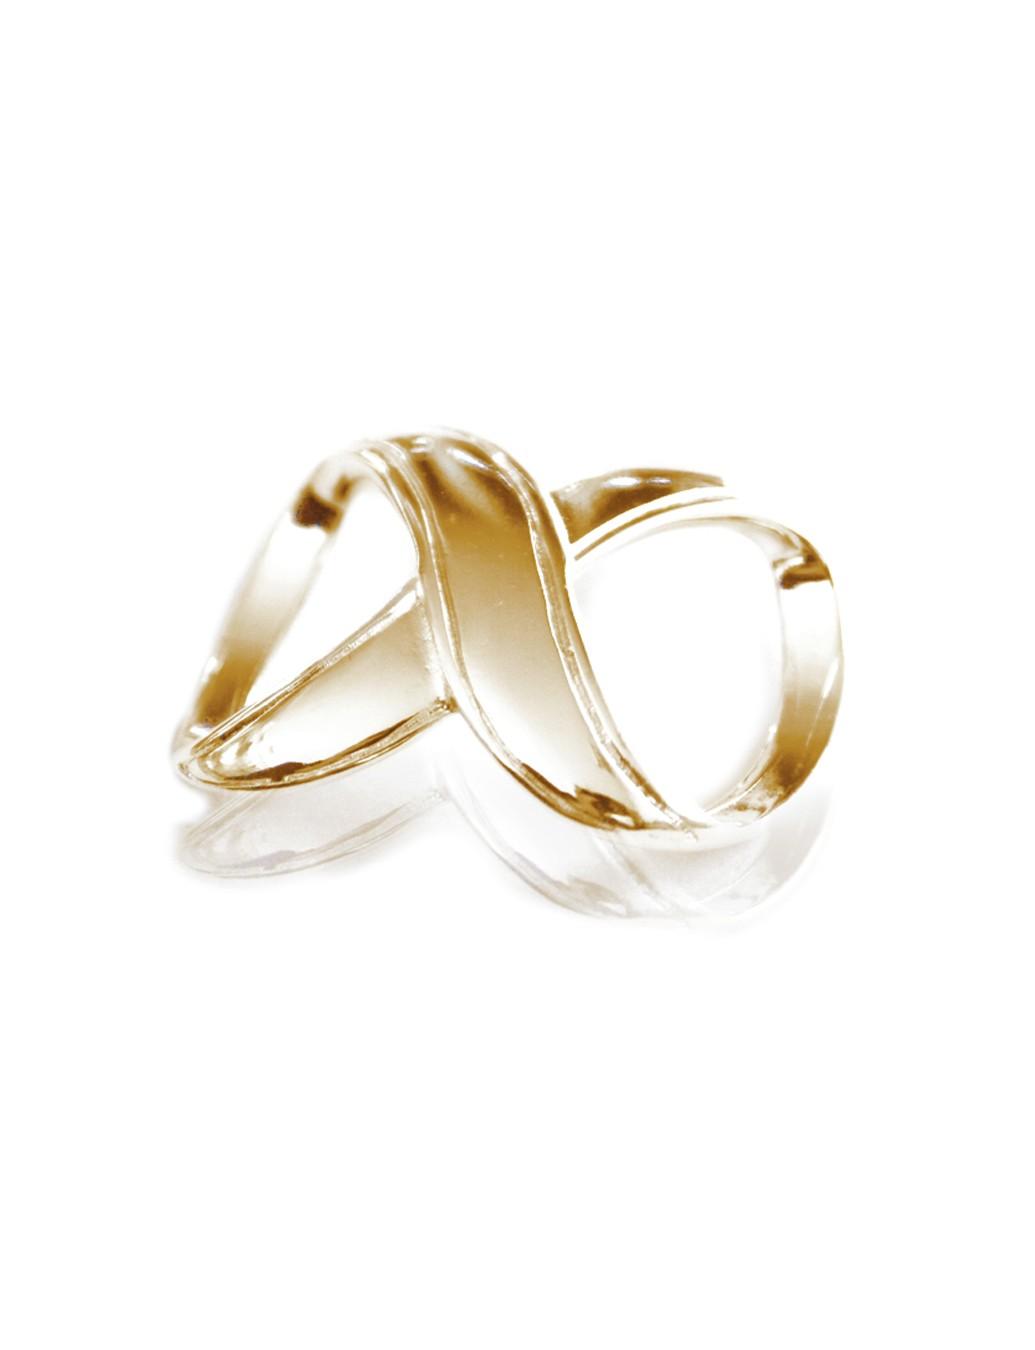 KLAMRA INFINITY DO PAREO - kolor złoty